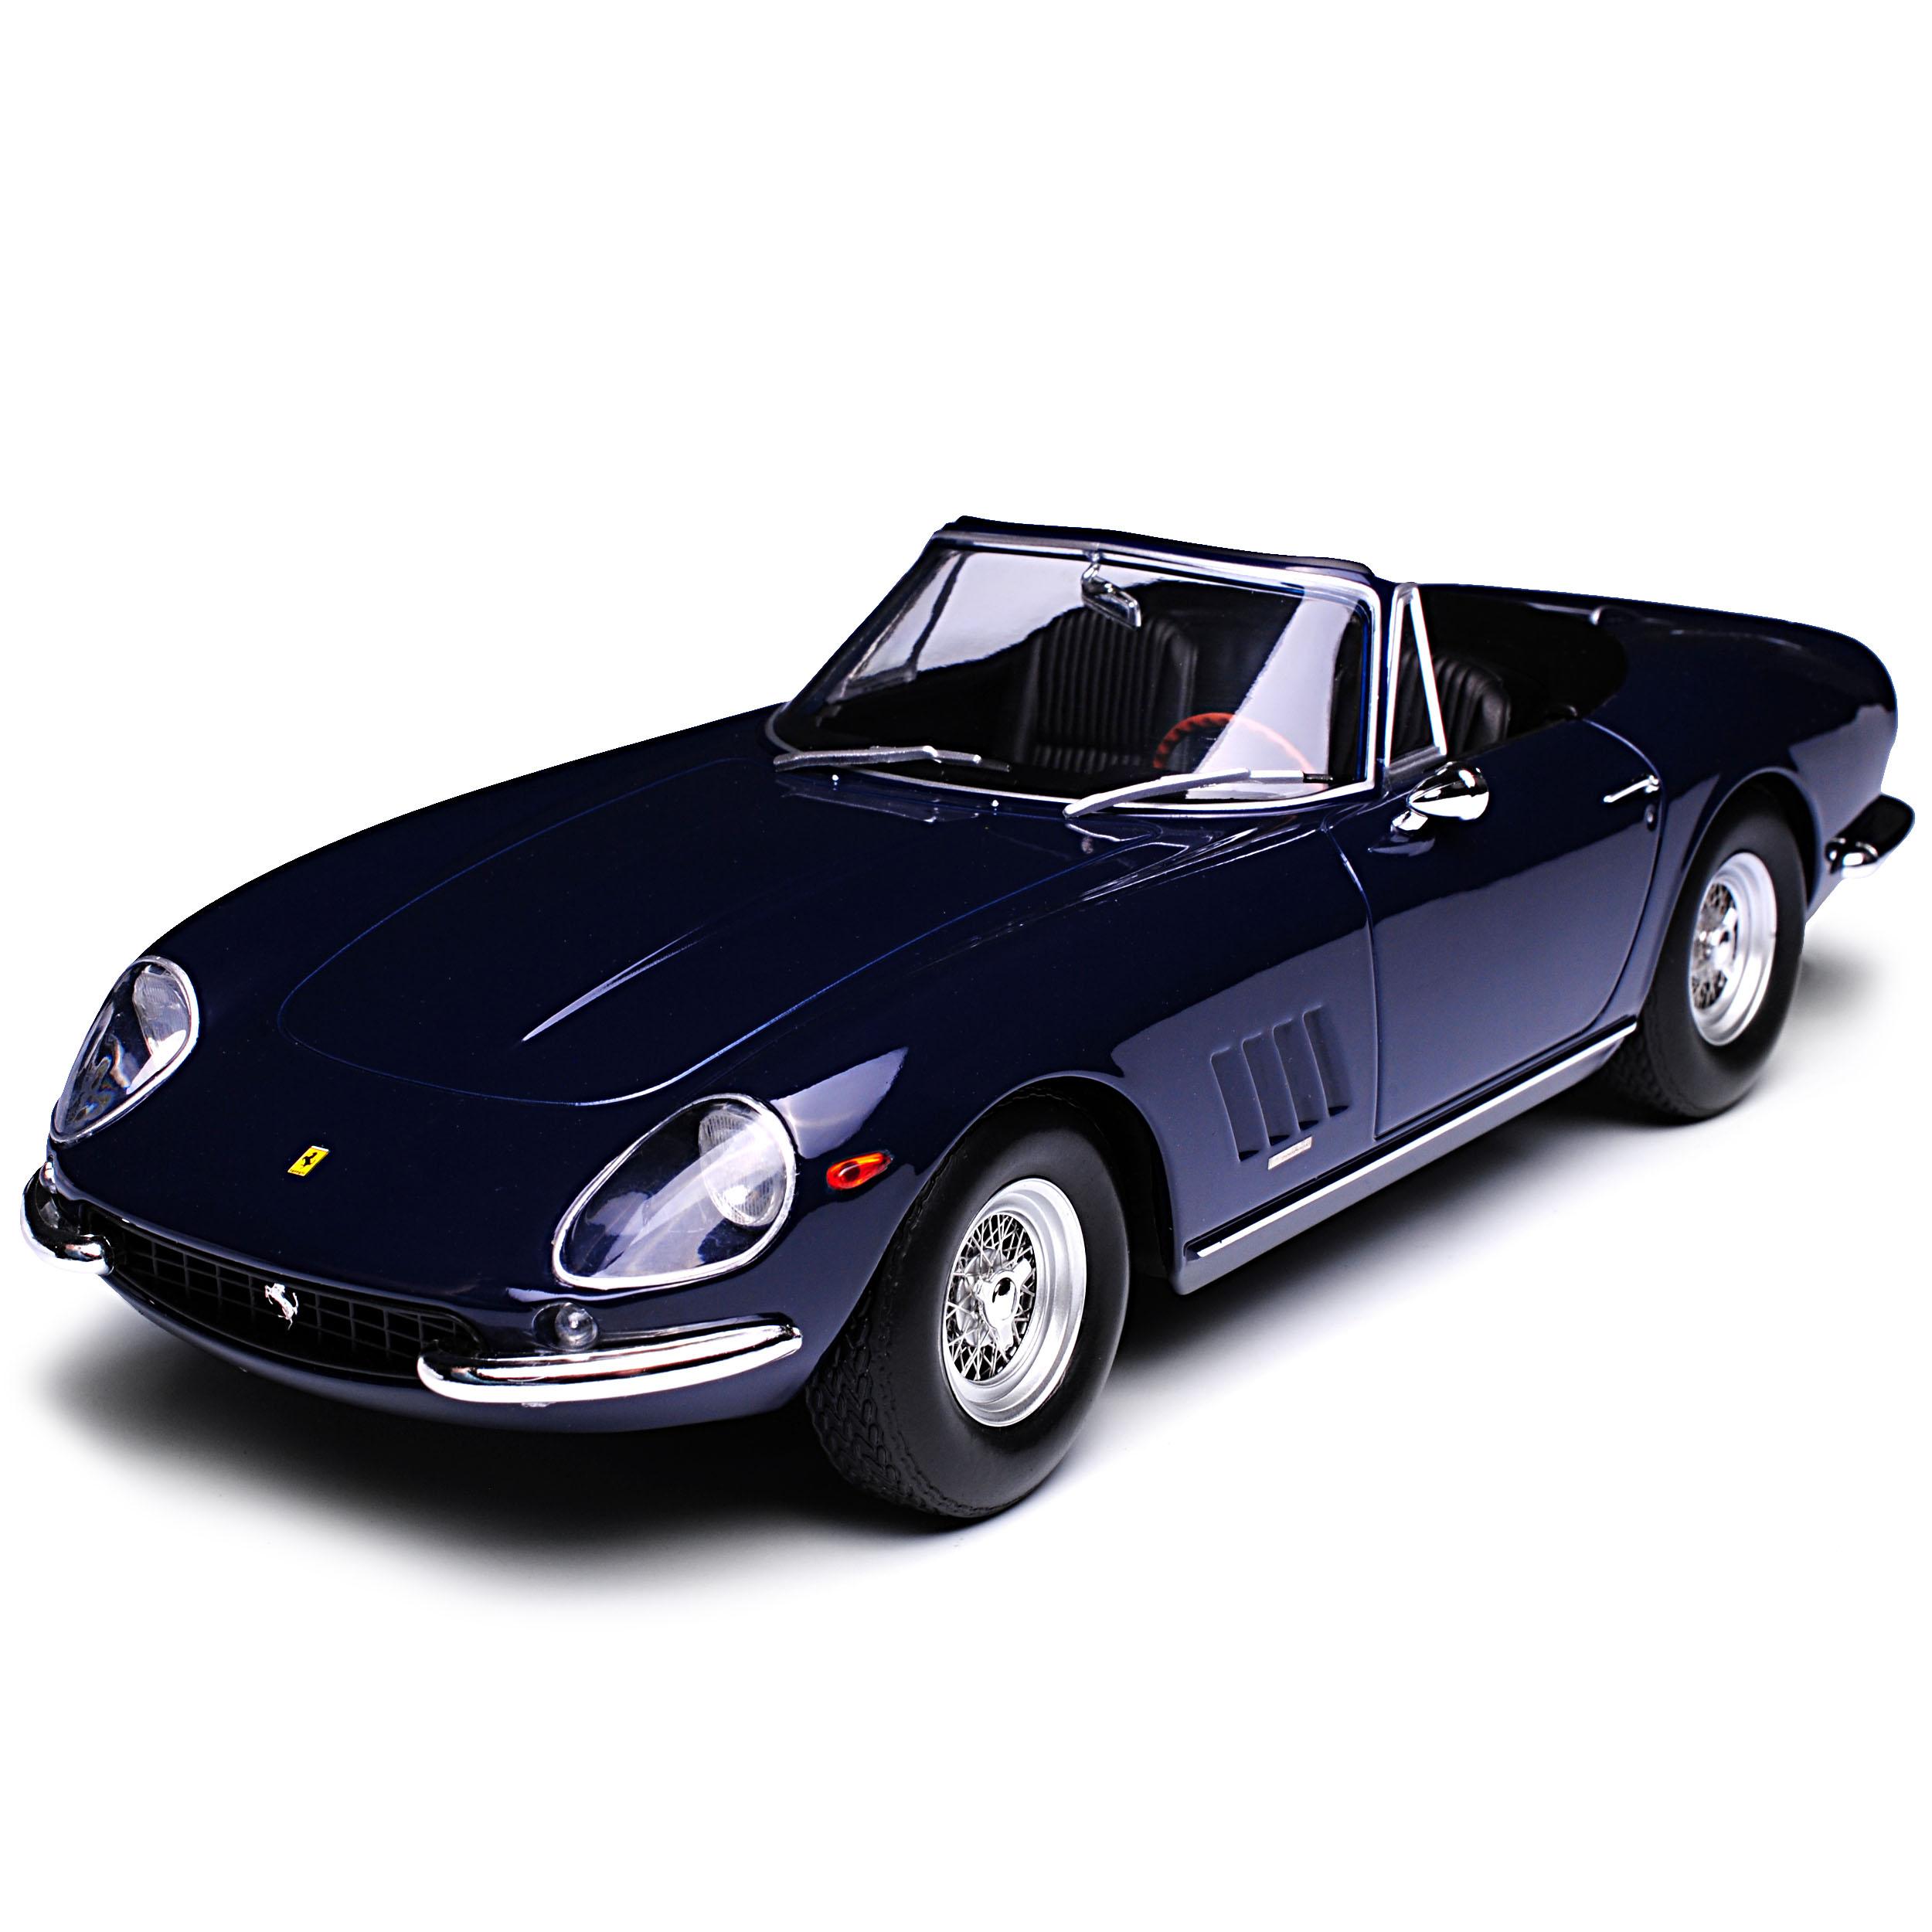 Ferrari 275 gtb4 lennart lennart lennart Spyder converdeible azul oscuro con Soft top tejado 1964-1968 Li... a739f0